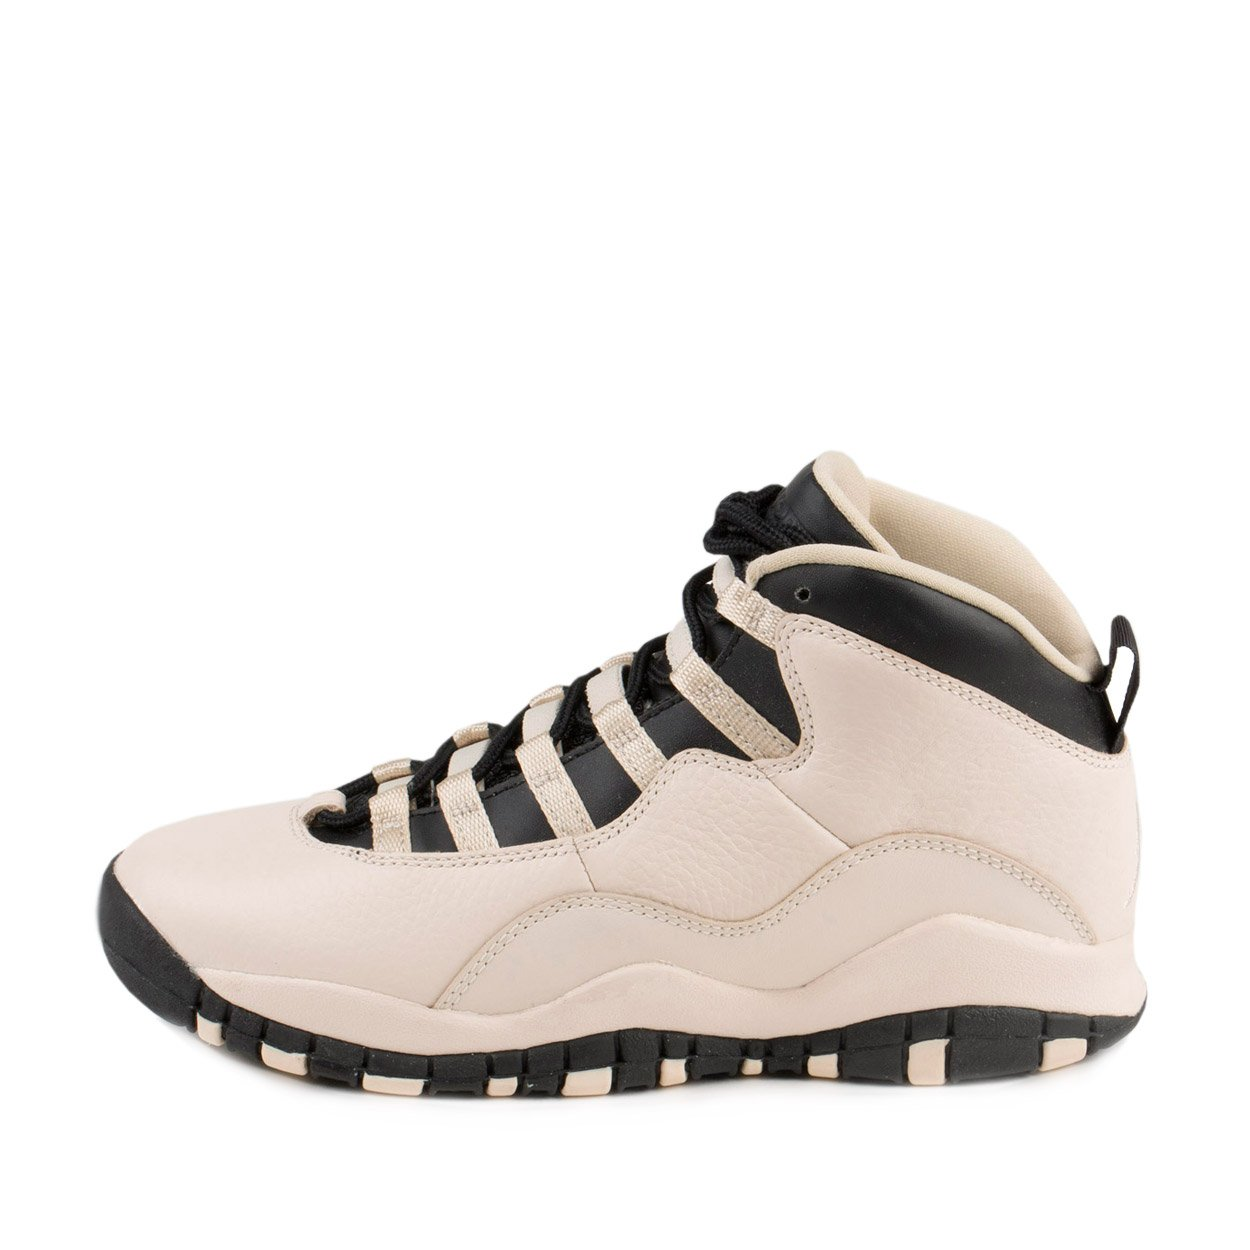 Jordan Nike Kids 10 Retro Prem GG Pearl White/Black/Black Basketball Shoe 6.5 Kids US by Jordan (Image #2)